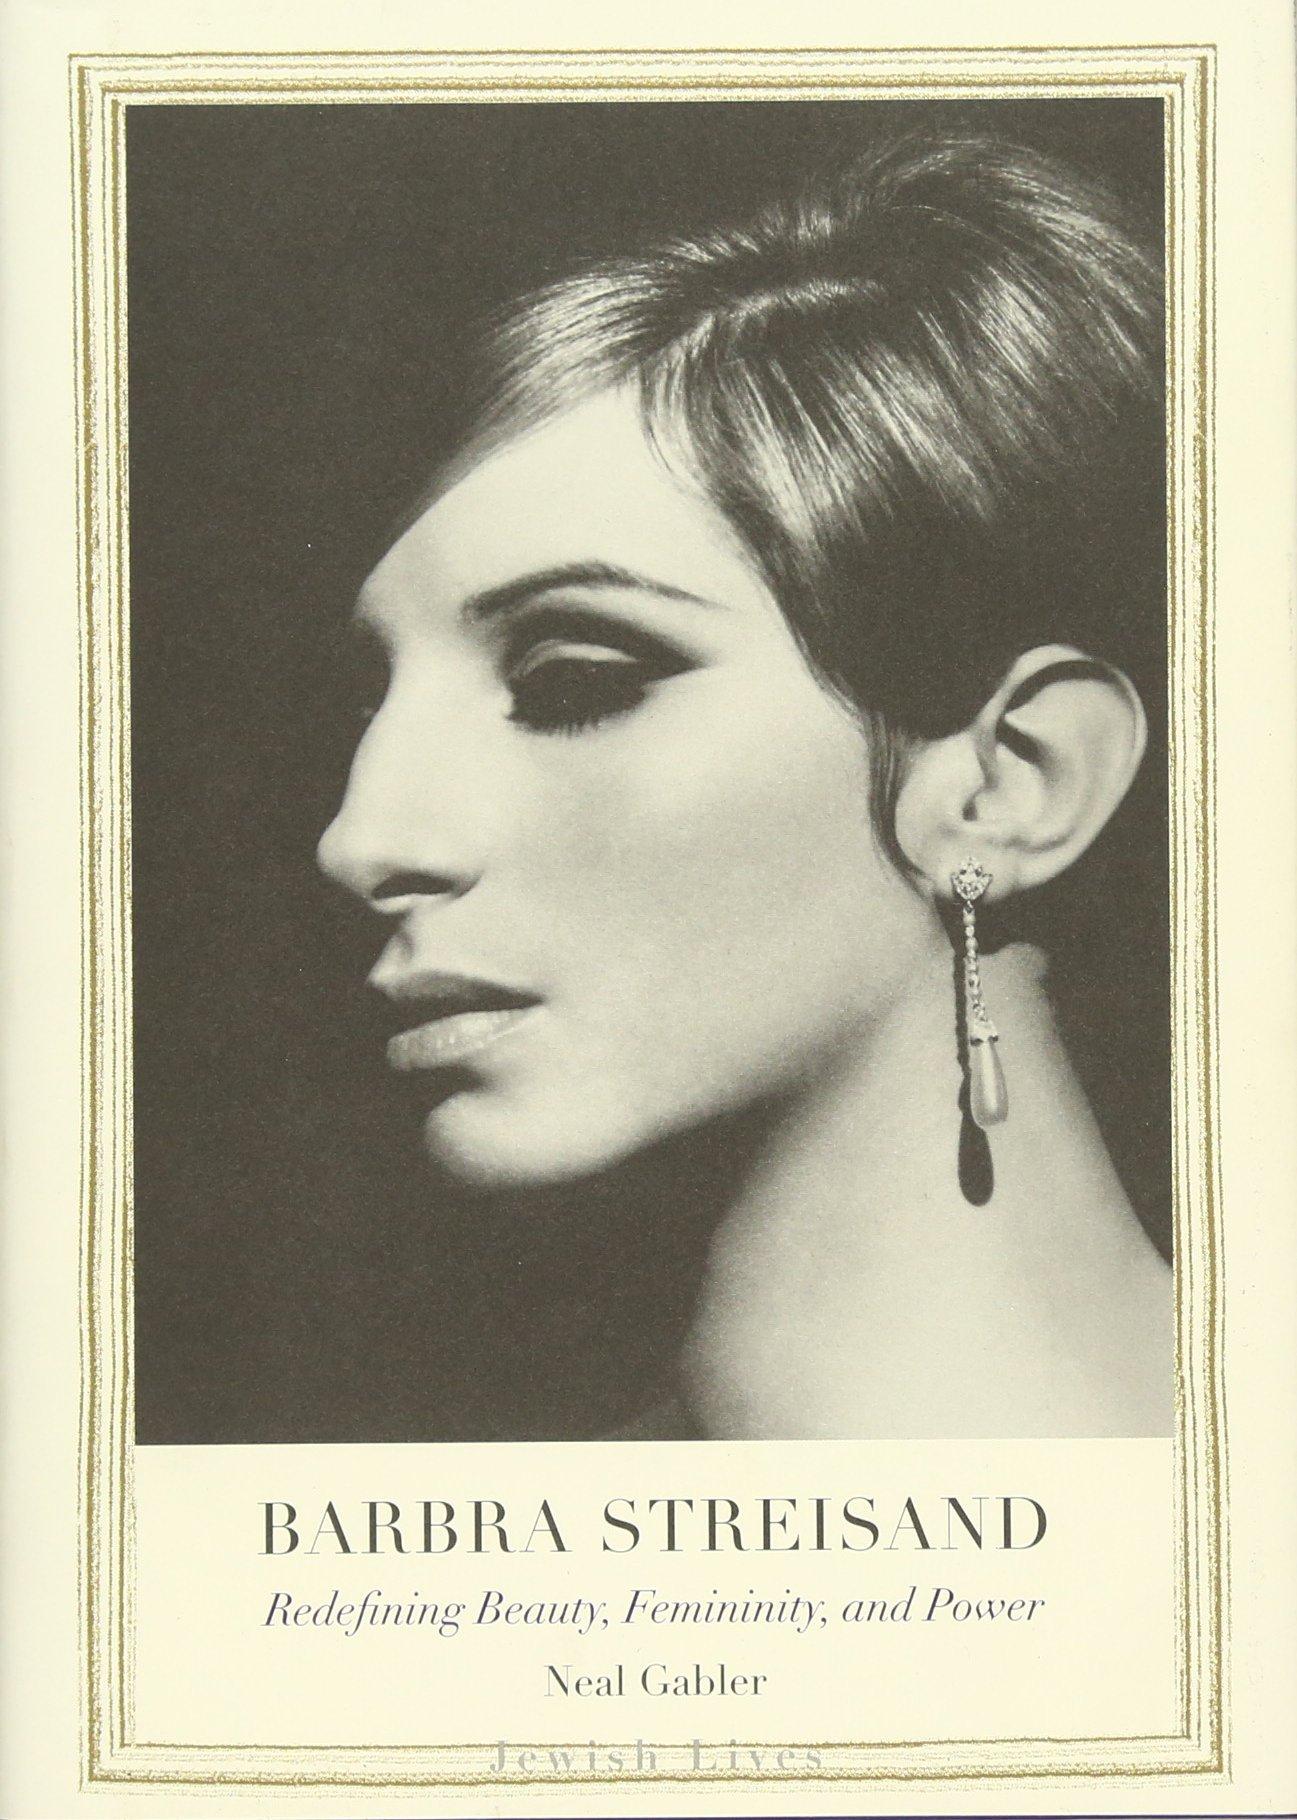 Barbra Streisand Redefining Beauty Femininity And Power Jewish Lives Amazon De Gabler Neal Fremdsprachige Bucher